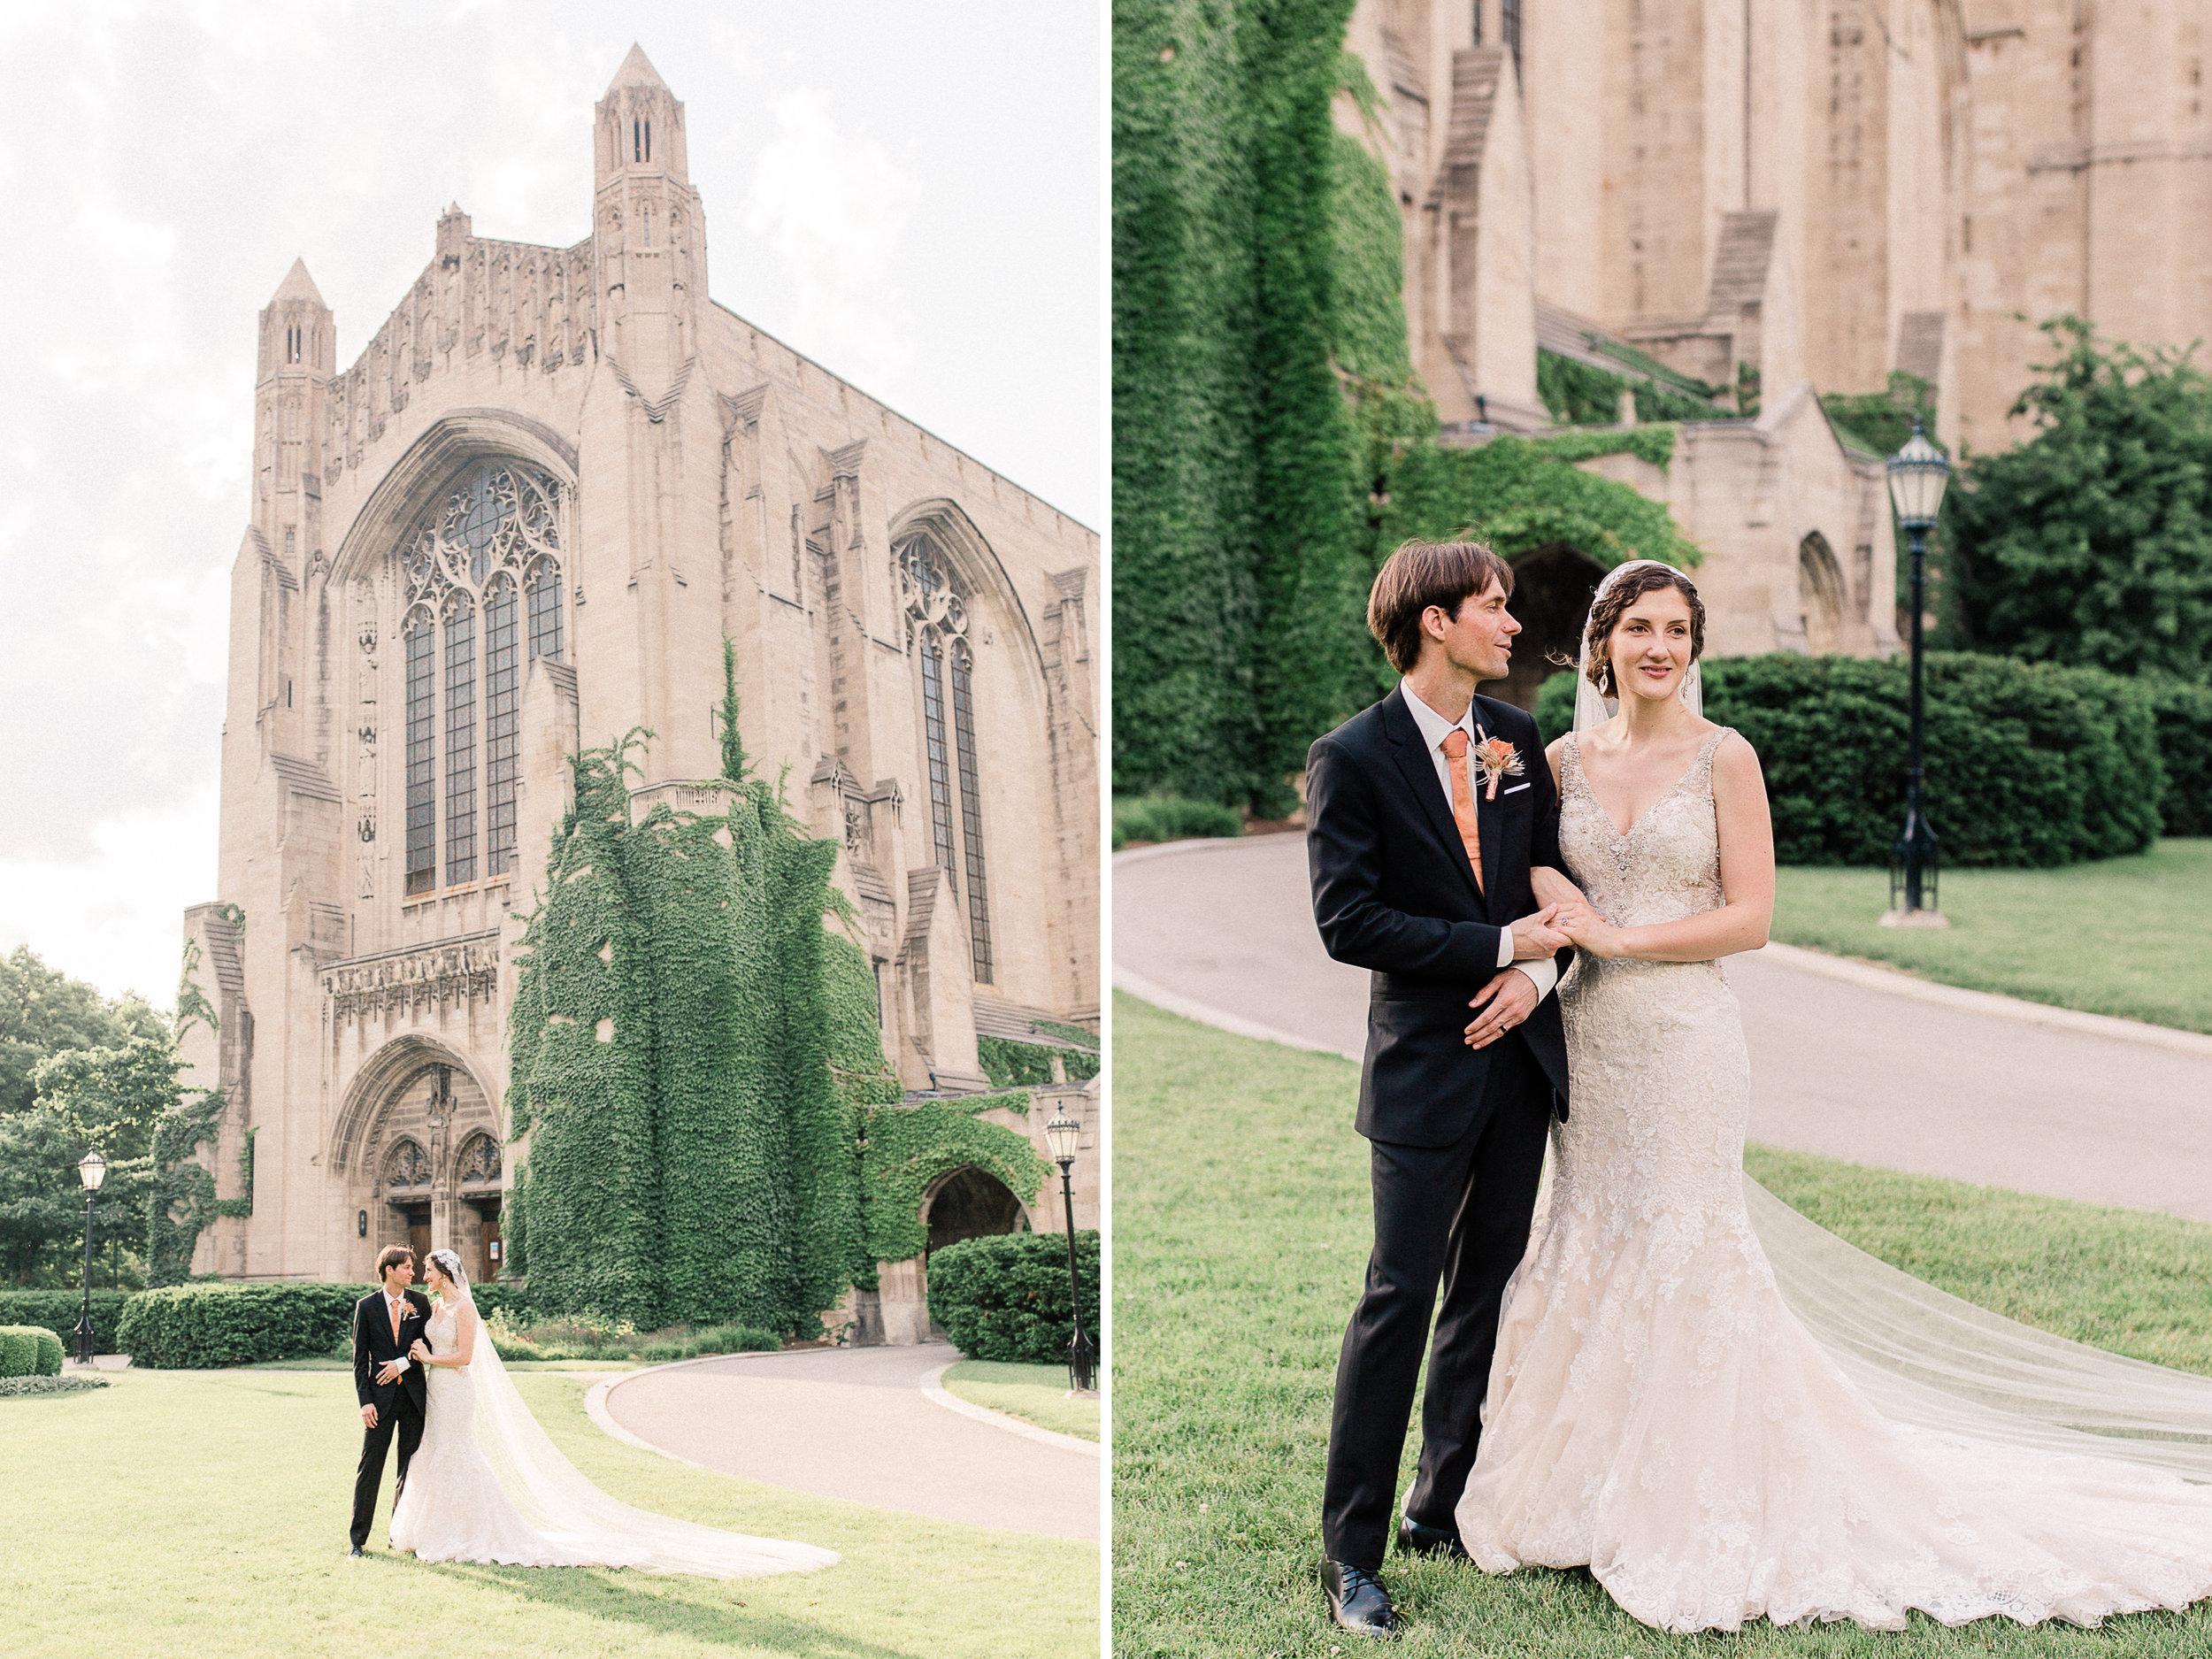 Dorothy_Louise_Photography_University_of_Chicago_Wedding16.jpg